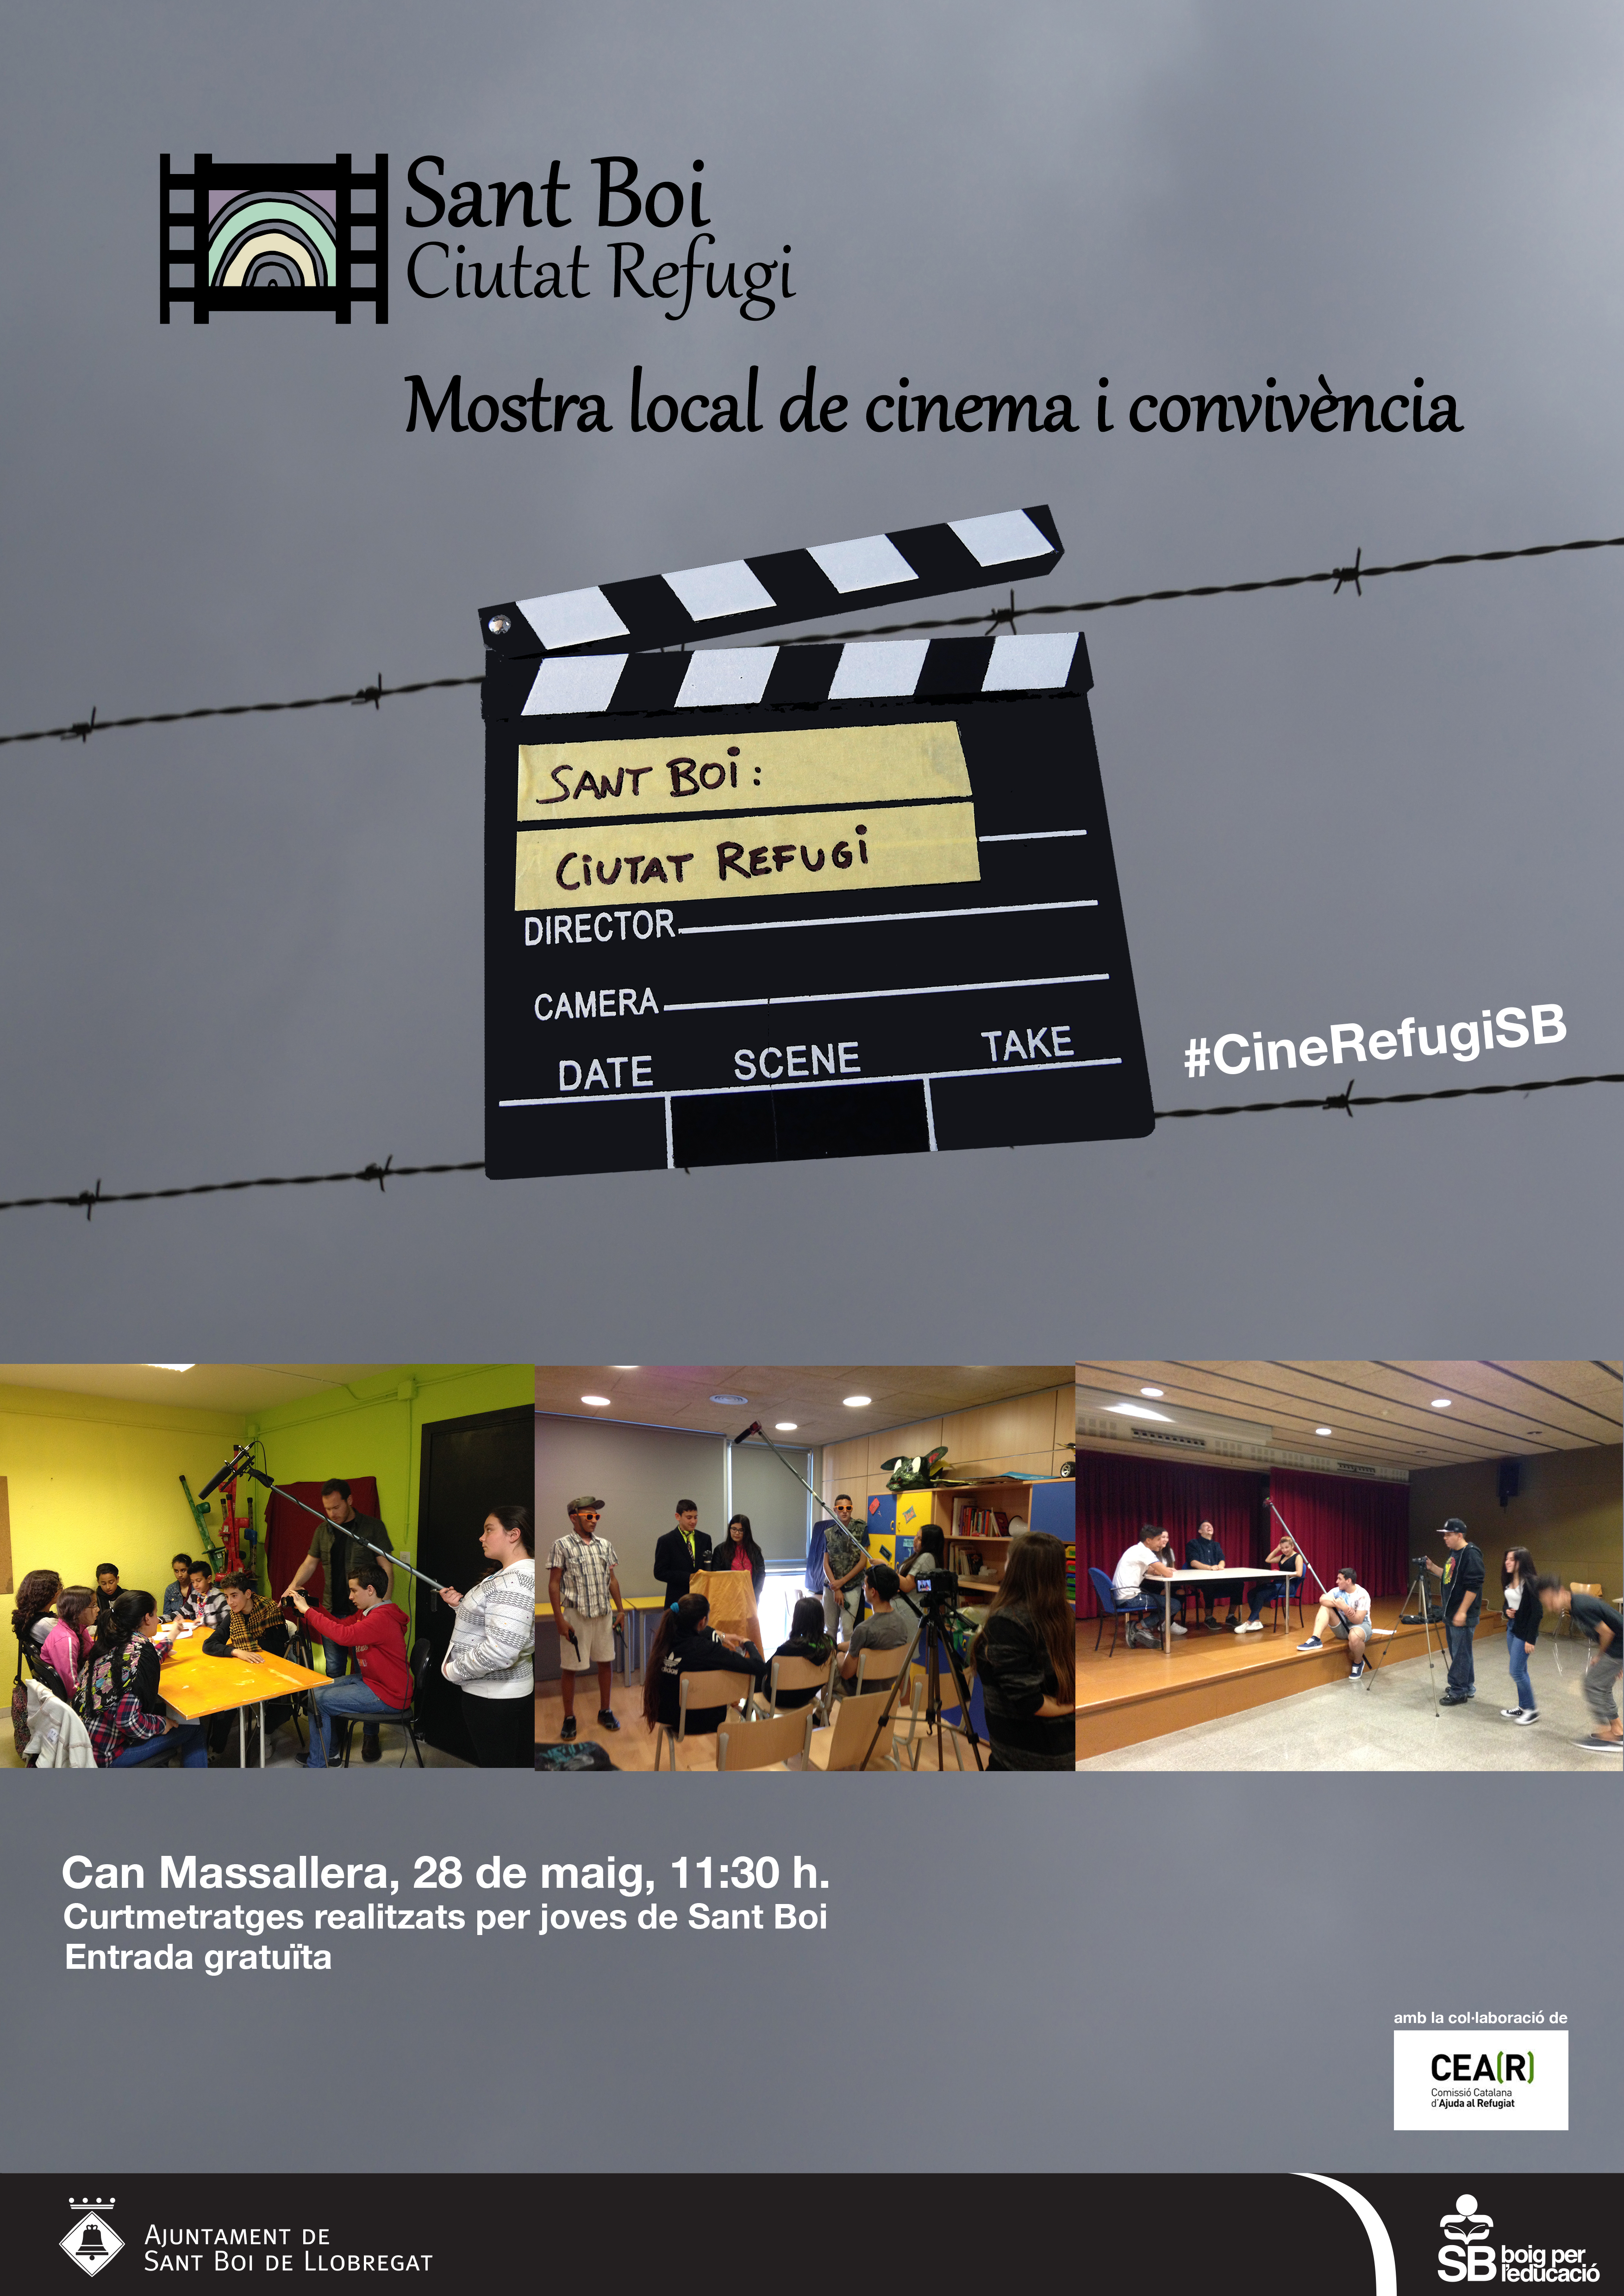 Mostra Local de Cinema i Convivència